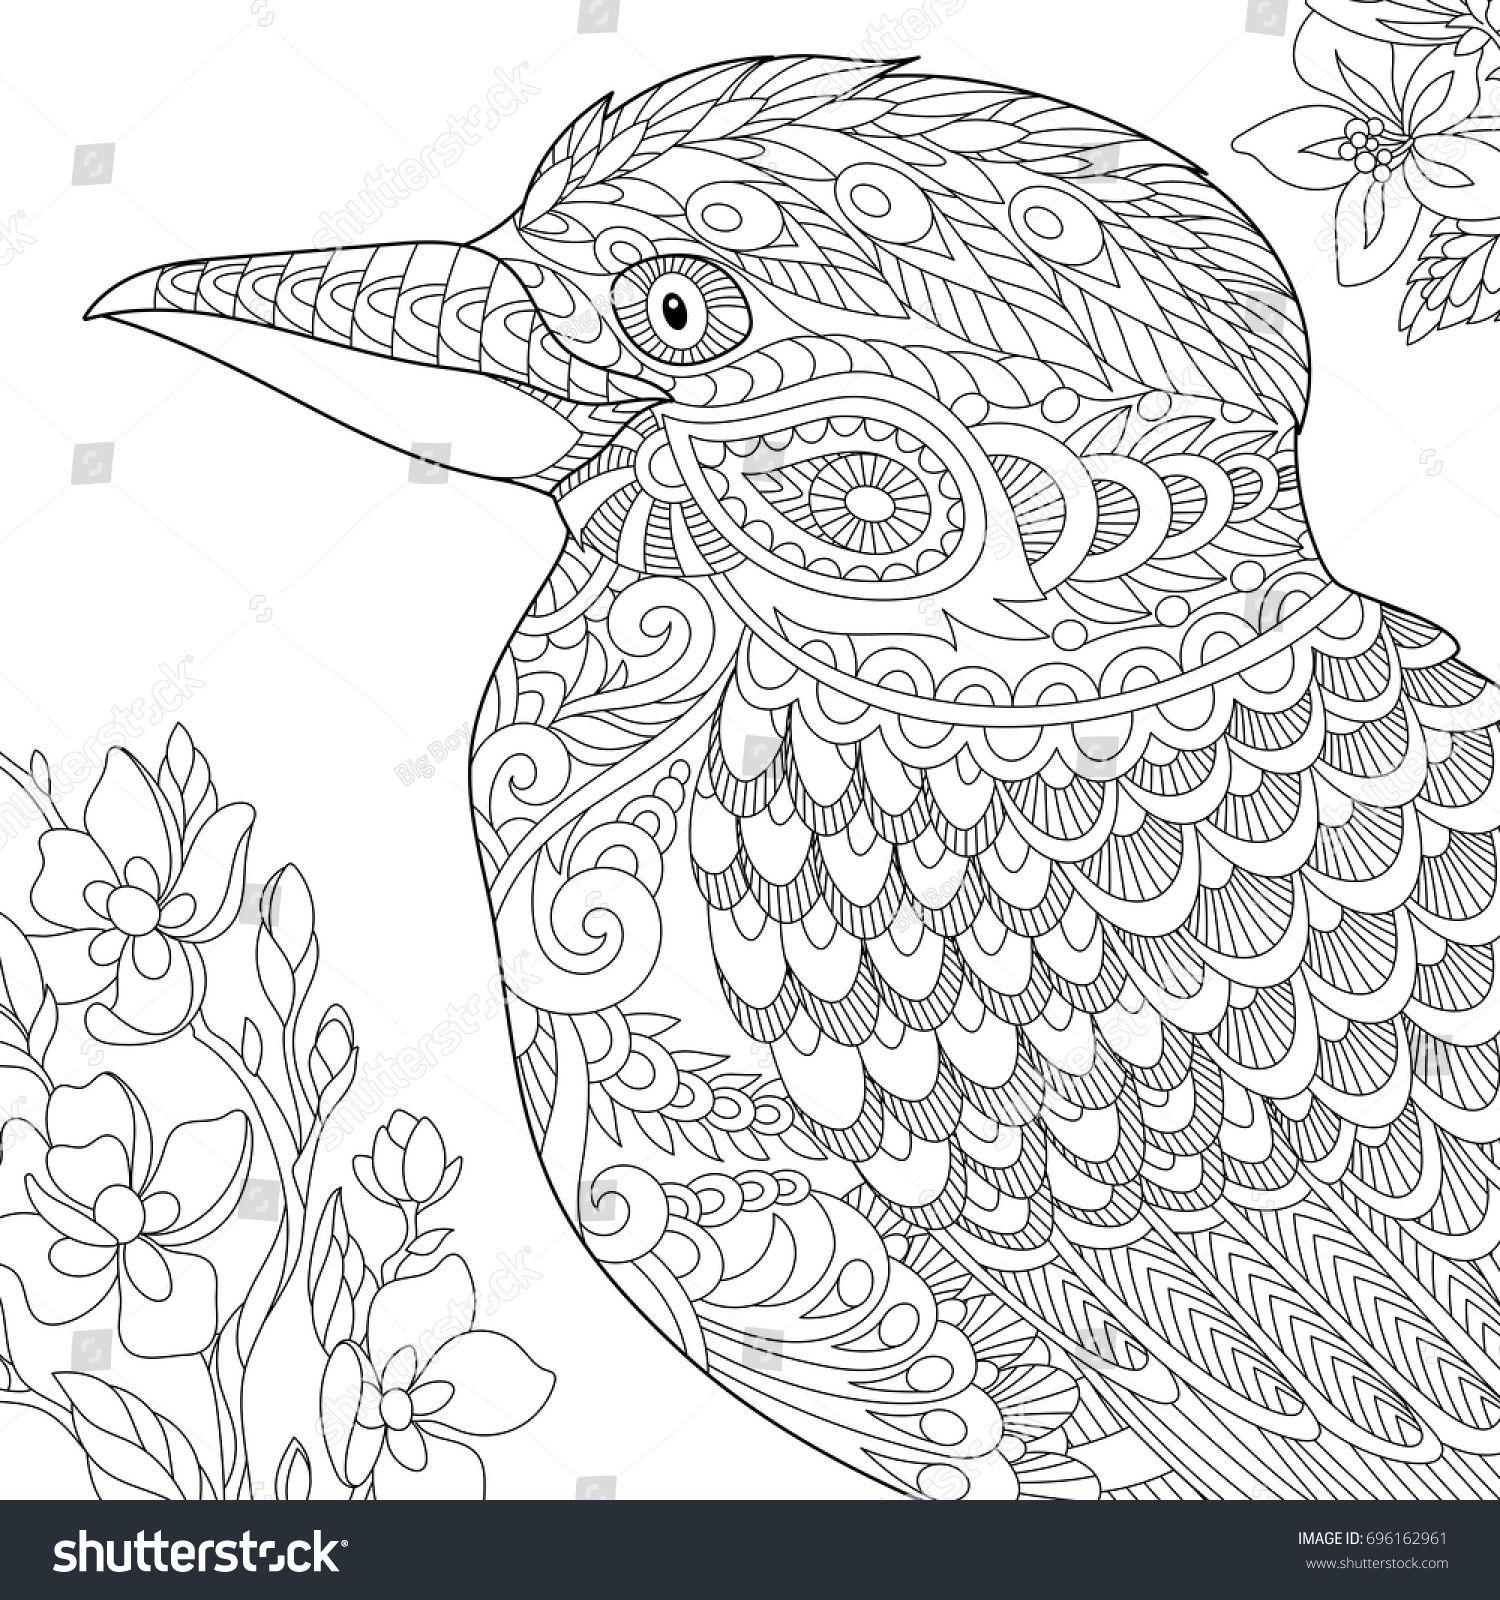 Pin de ColoringPageExpress en Zentangle Designs   Pinterest ...